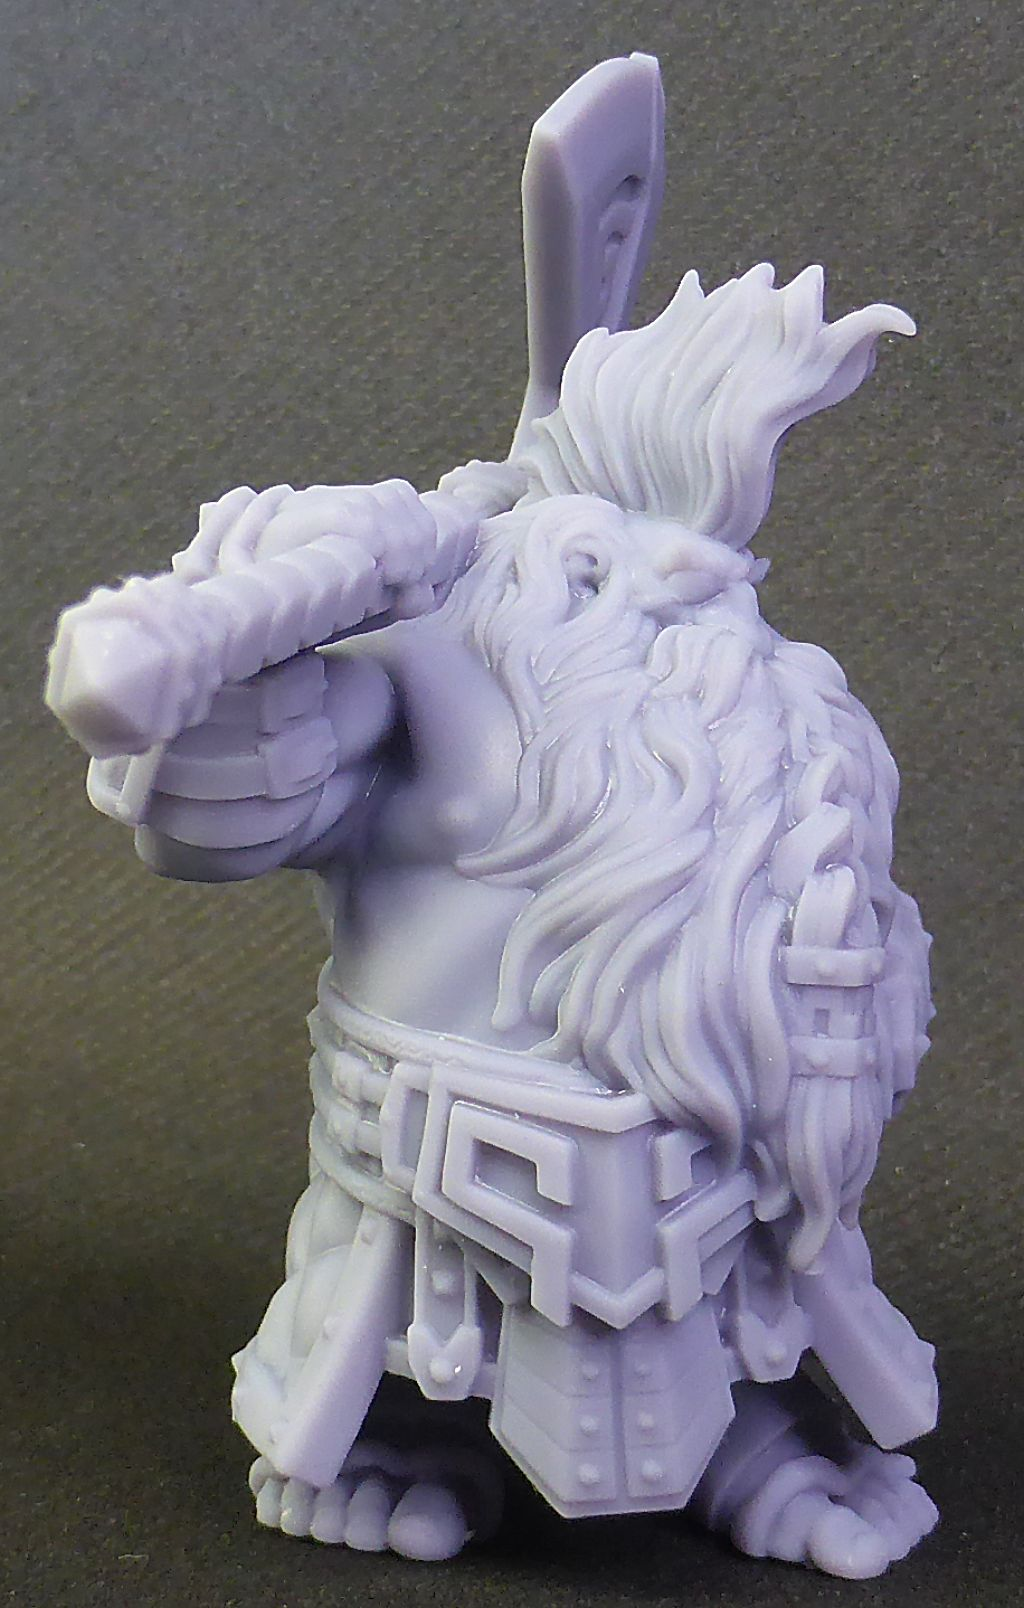 Impression 3D Résine - Figurine de Nain Nain-017